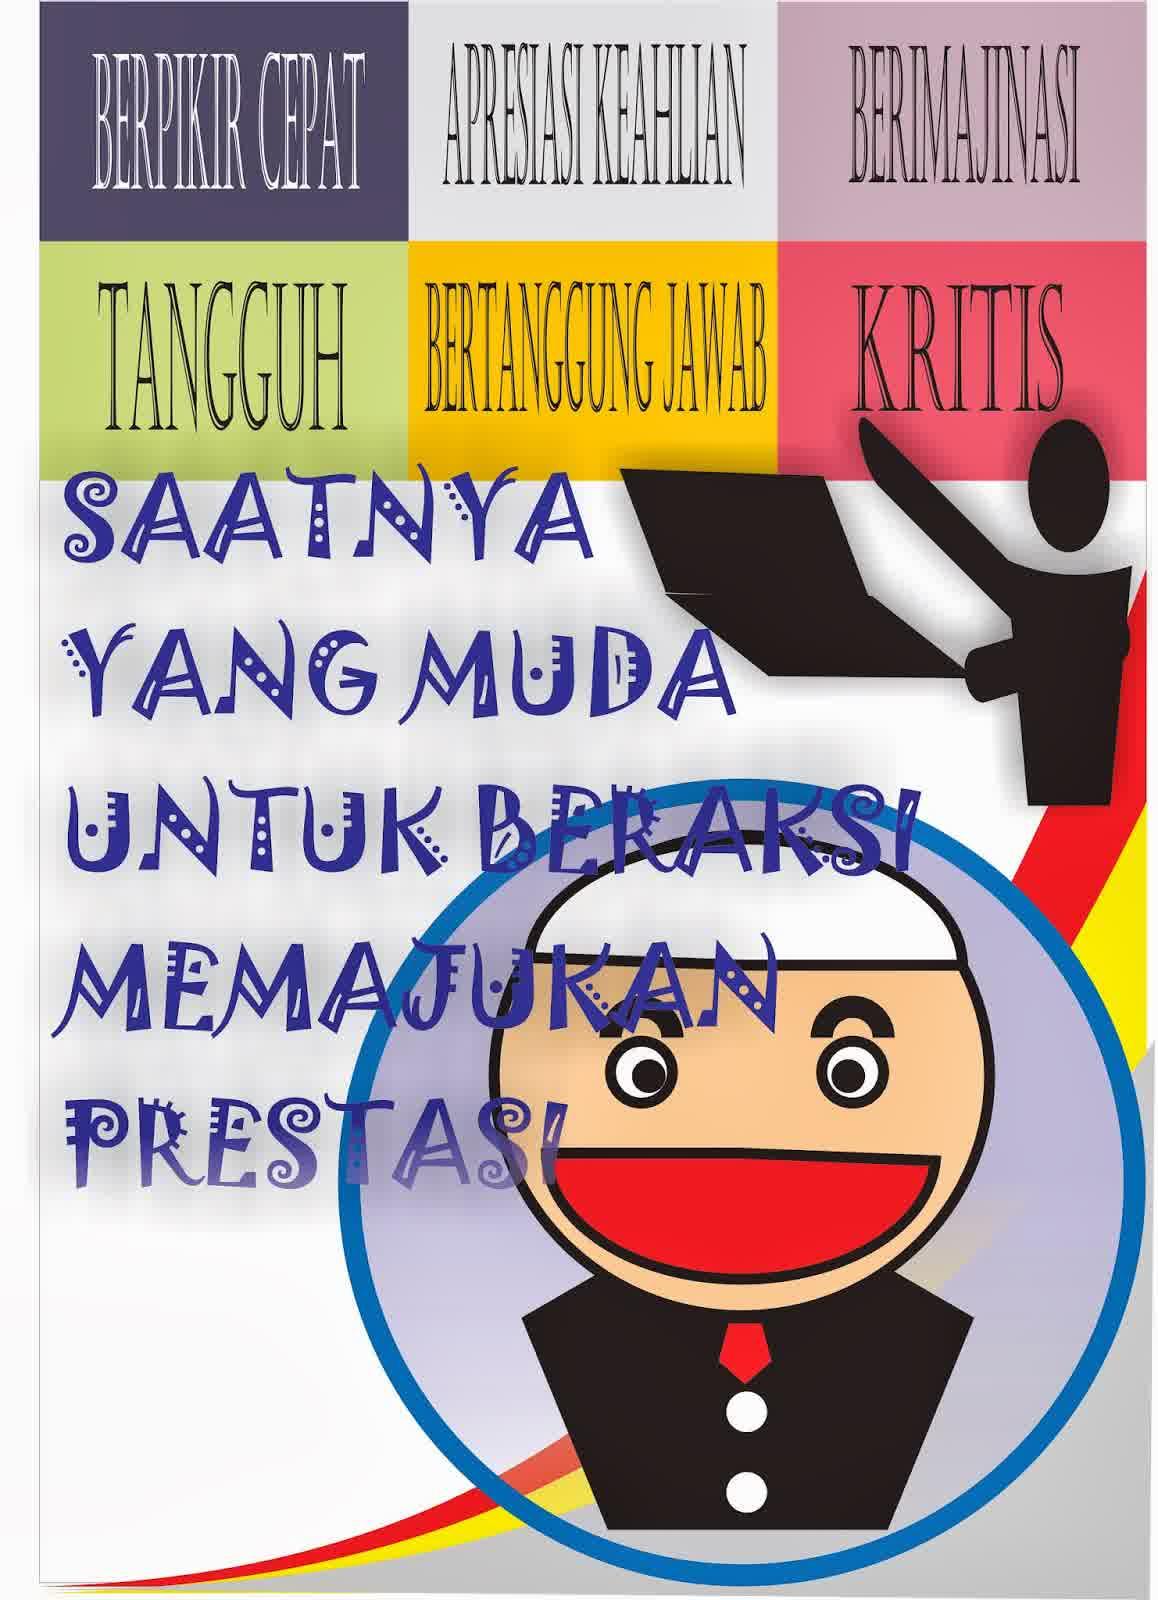 Contoh Gambar Slogan Pendidikan Materi Pelajaran 10